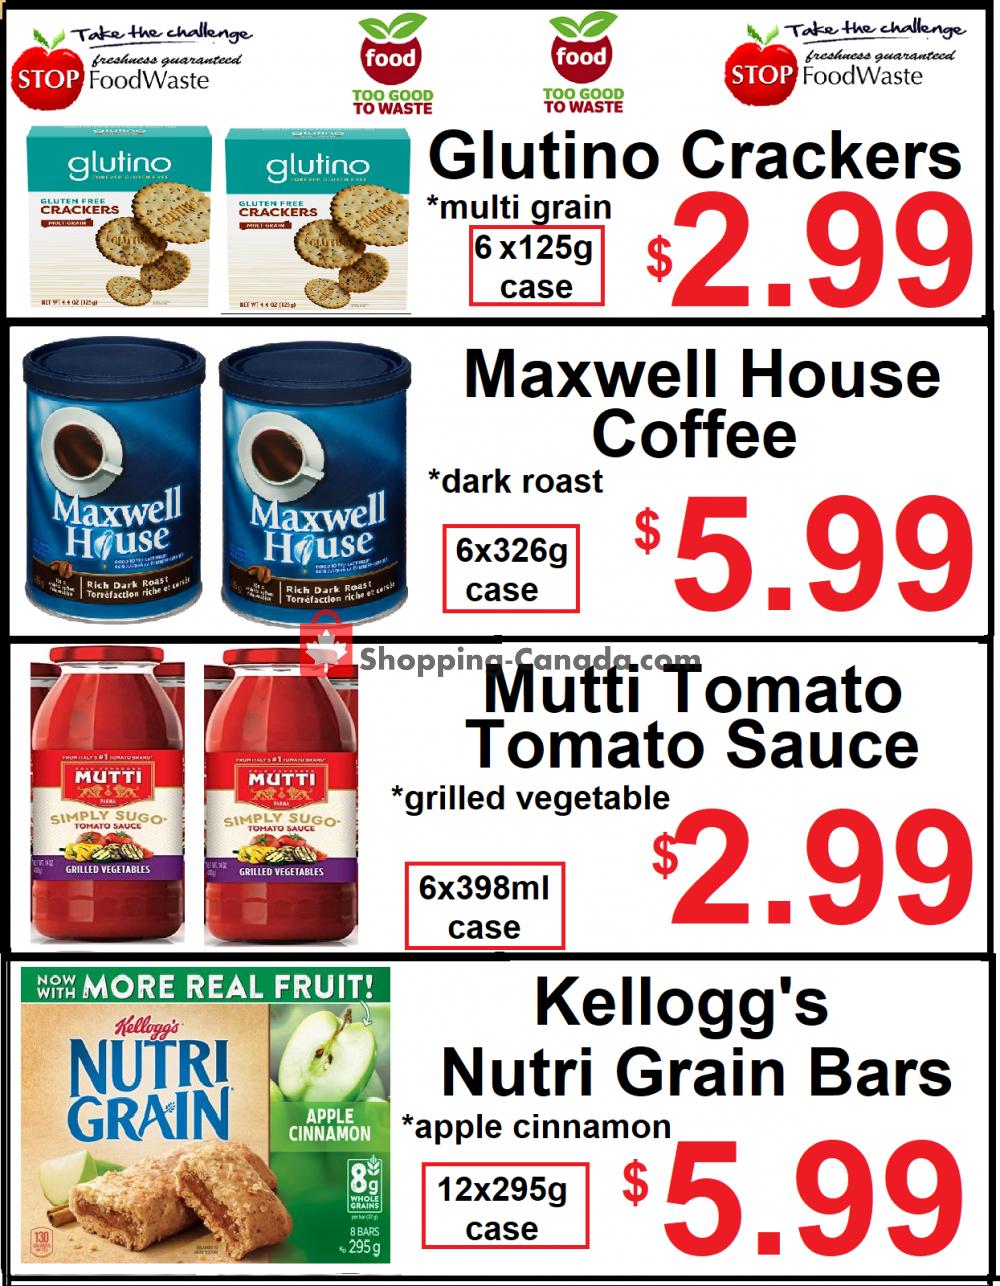 Flyer Food 4 Less Canada - from Friday January 15, 2021 to Thursday January 21, 2021